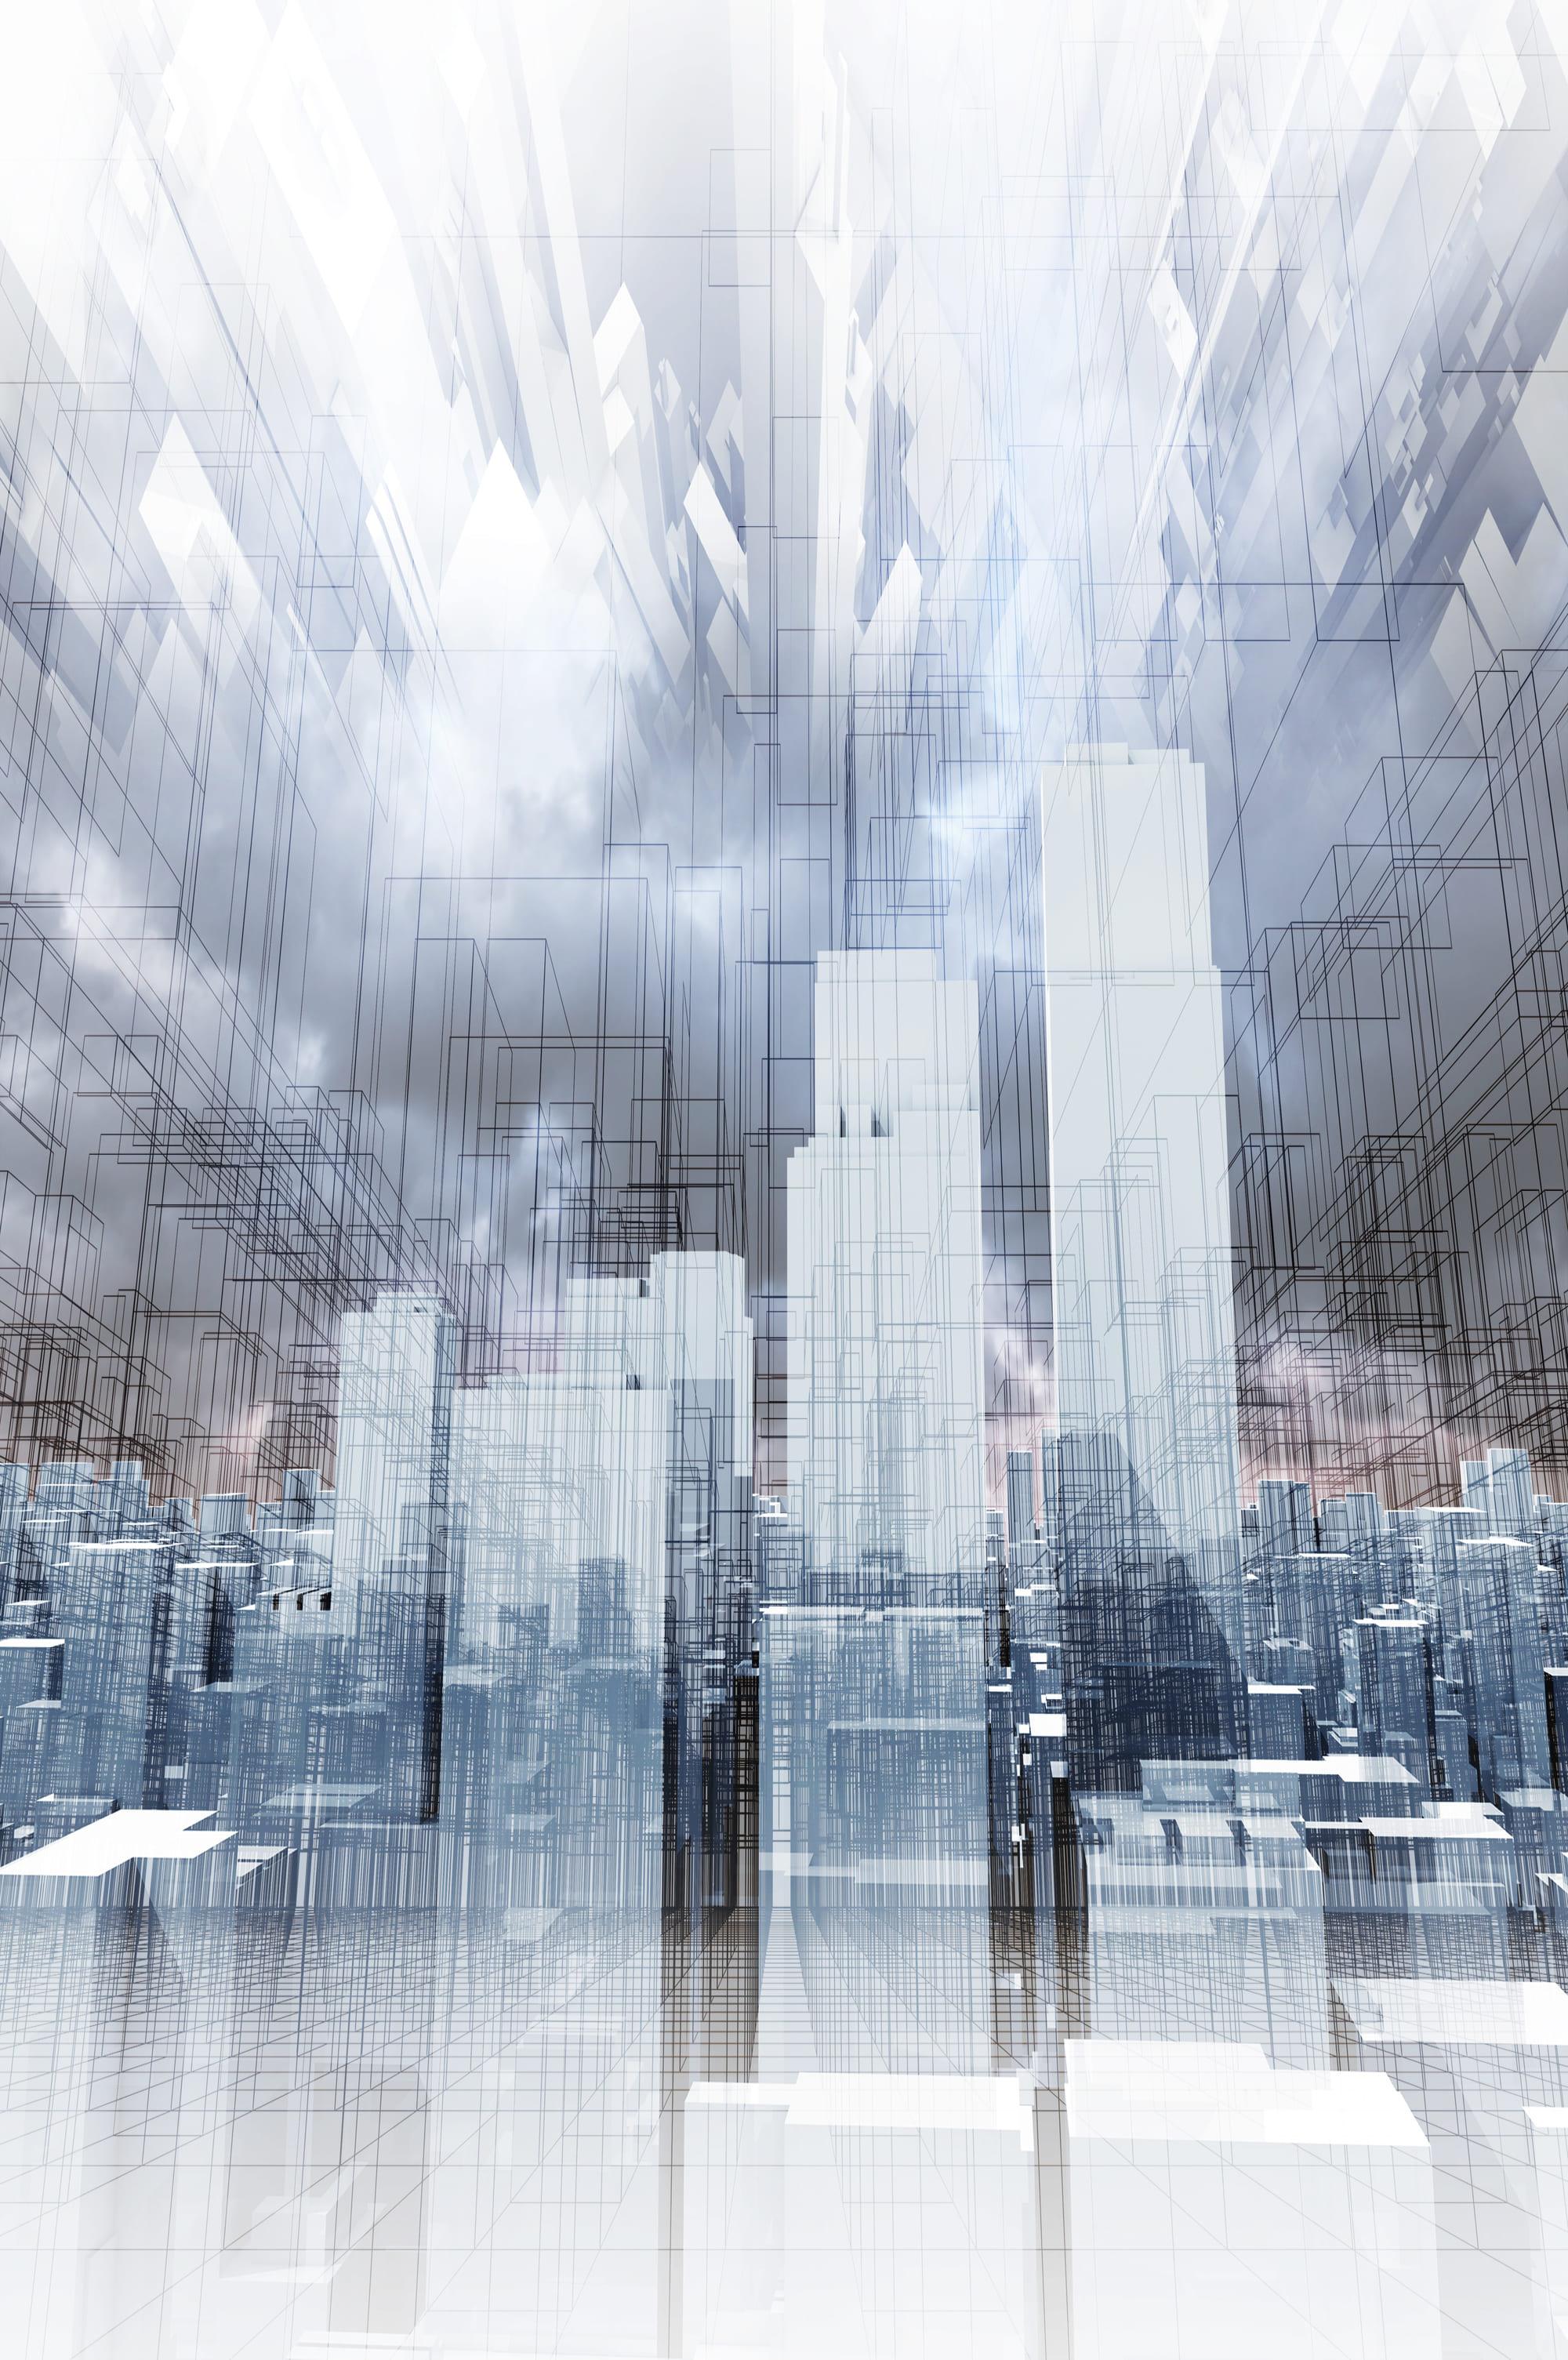 MG Named a U.S. Reseller Partner for CyberCity 3D, Inc.